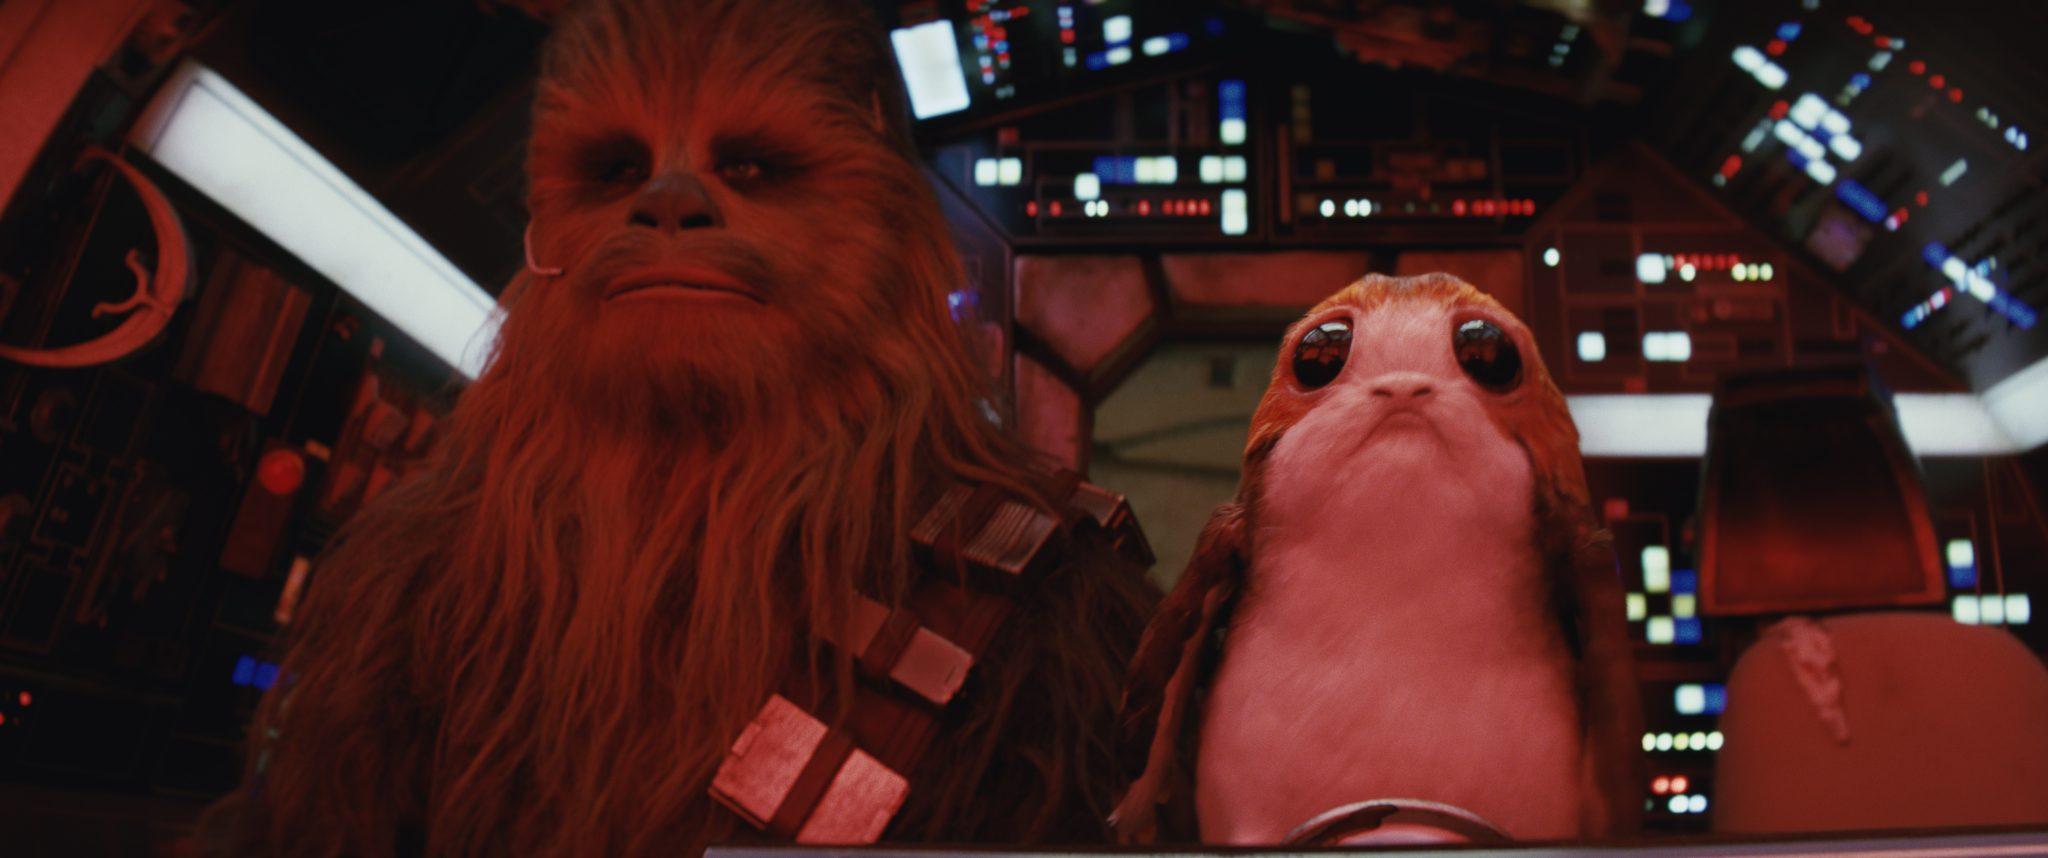 Star Wars : Les Derniers Jedi Porgs